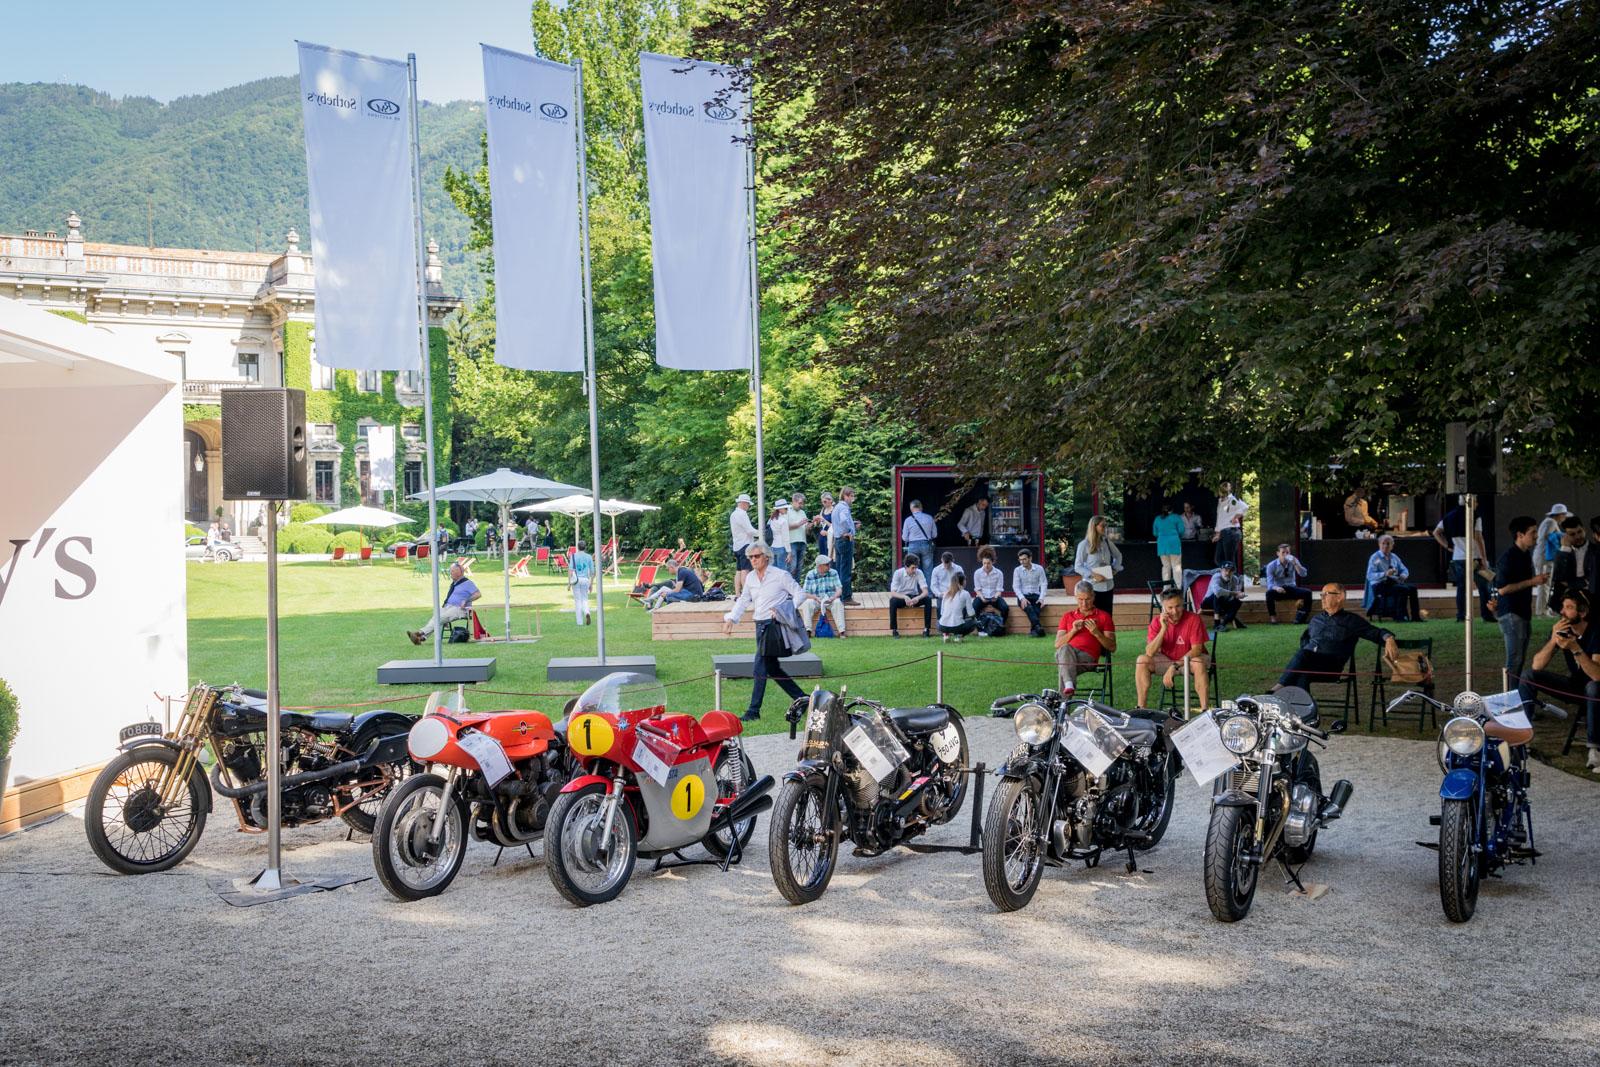 2017_05_27_Concorso eleganza villa erba (131 di 150)